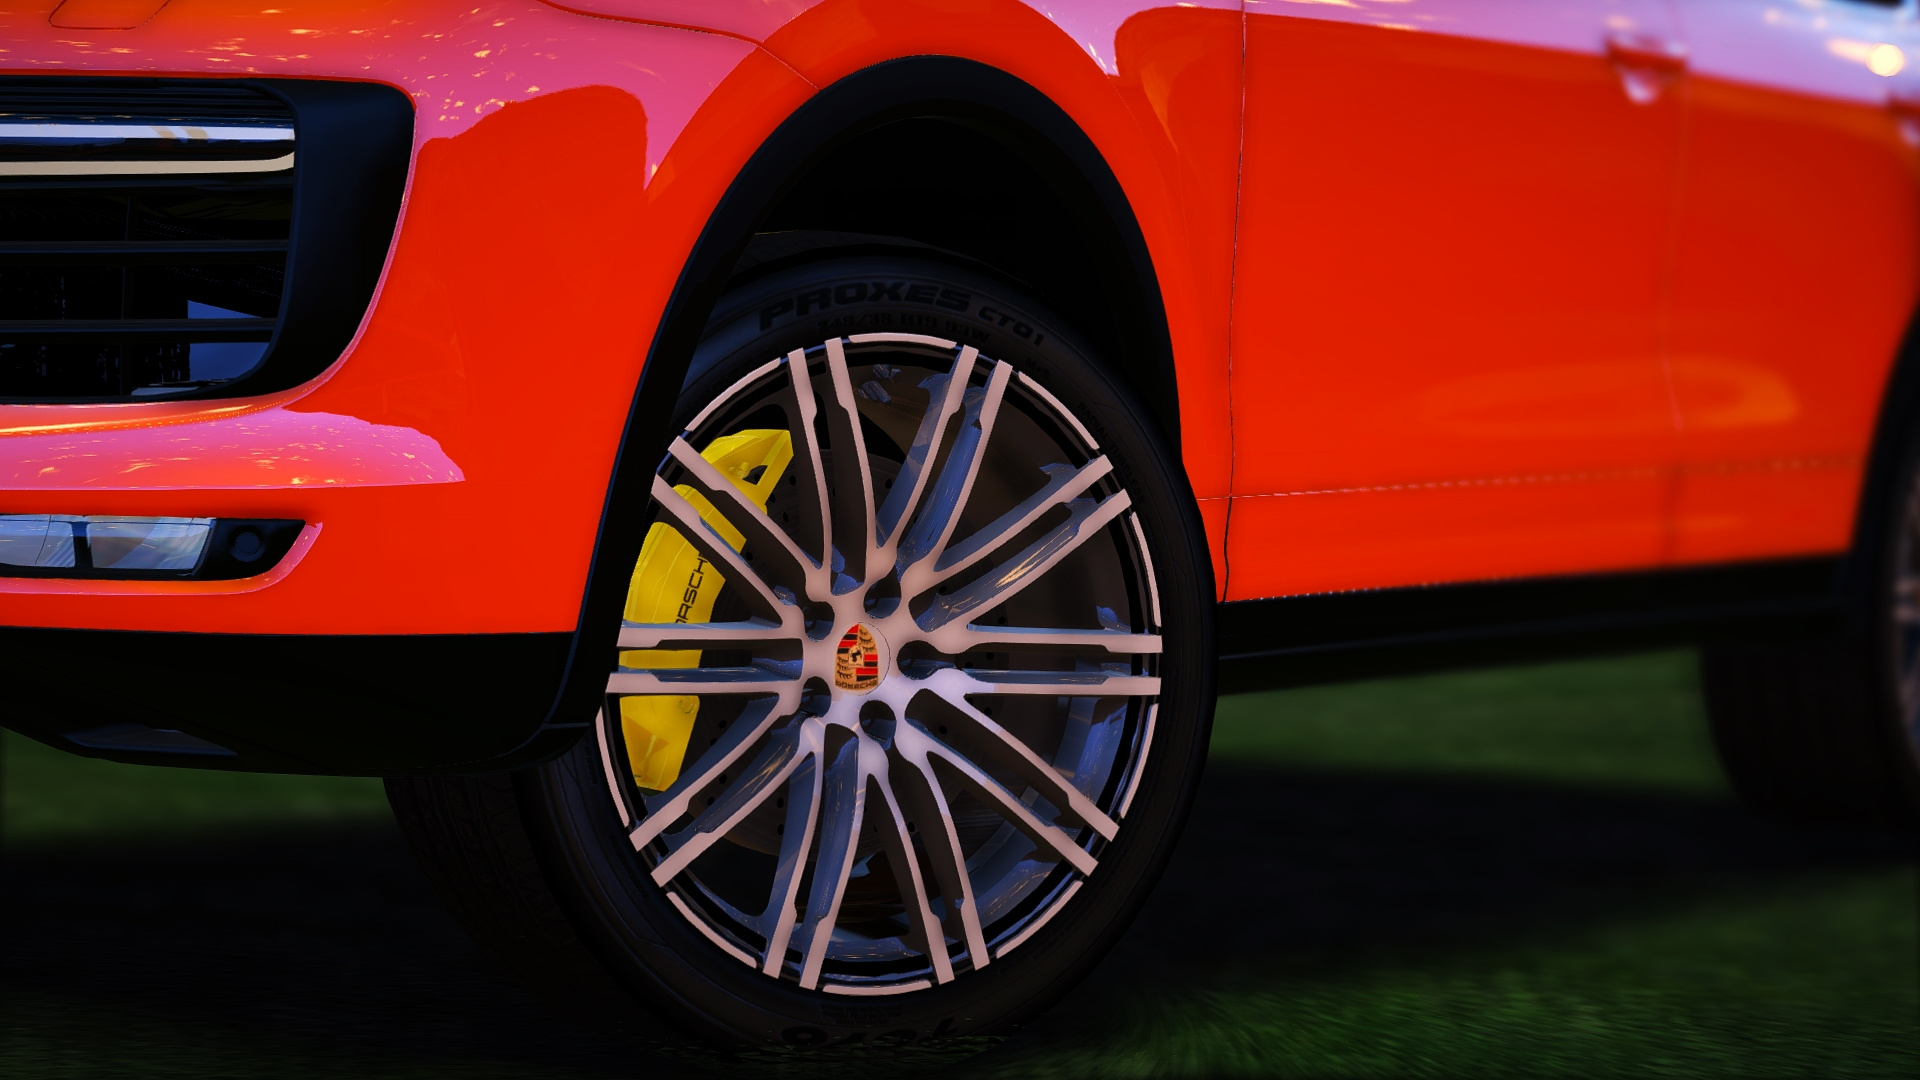 2016 Porsche Cayenne Turbo S [Add-On / Replace] - GTA5-Mods.com on porsche 911 rims, porsche racing rims, mercedes benz g class rims, bmw x5 4.8i rims, suzuki verona rims, 918 spyder rims, mercedes a class rims, black yukon with rims, mercedes-benz s-class rims, porsche white rims, porsche boxster rims, hummer h2 sut rims, cayenne s rims, bmw 6 series convertible rims, porsche suv rims, chevrolet uplander rims, jeep grand cherokee rims, 1983 944 chrome rims, audi a6 quattro rims, porsche panamera rims,